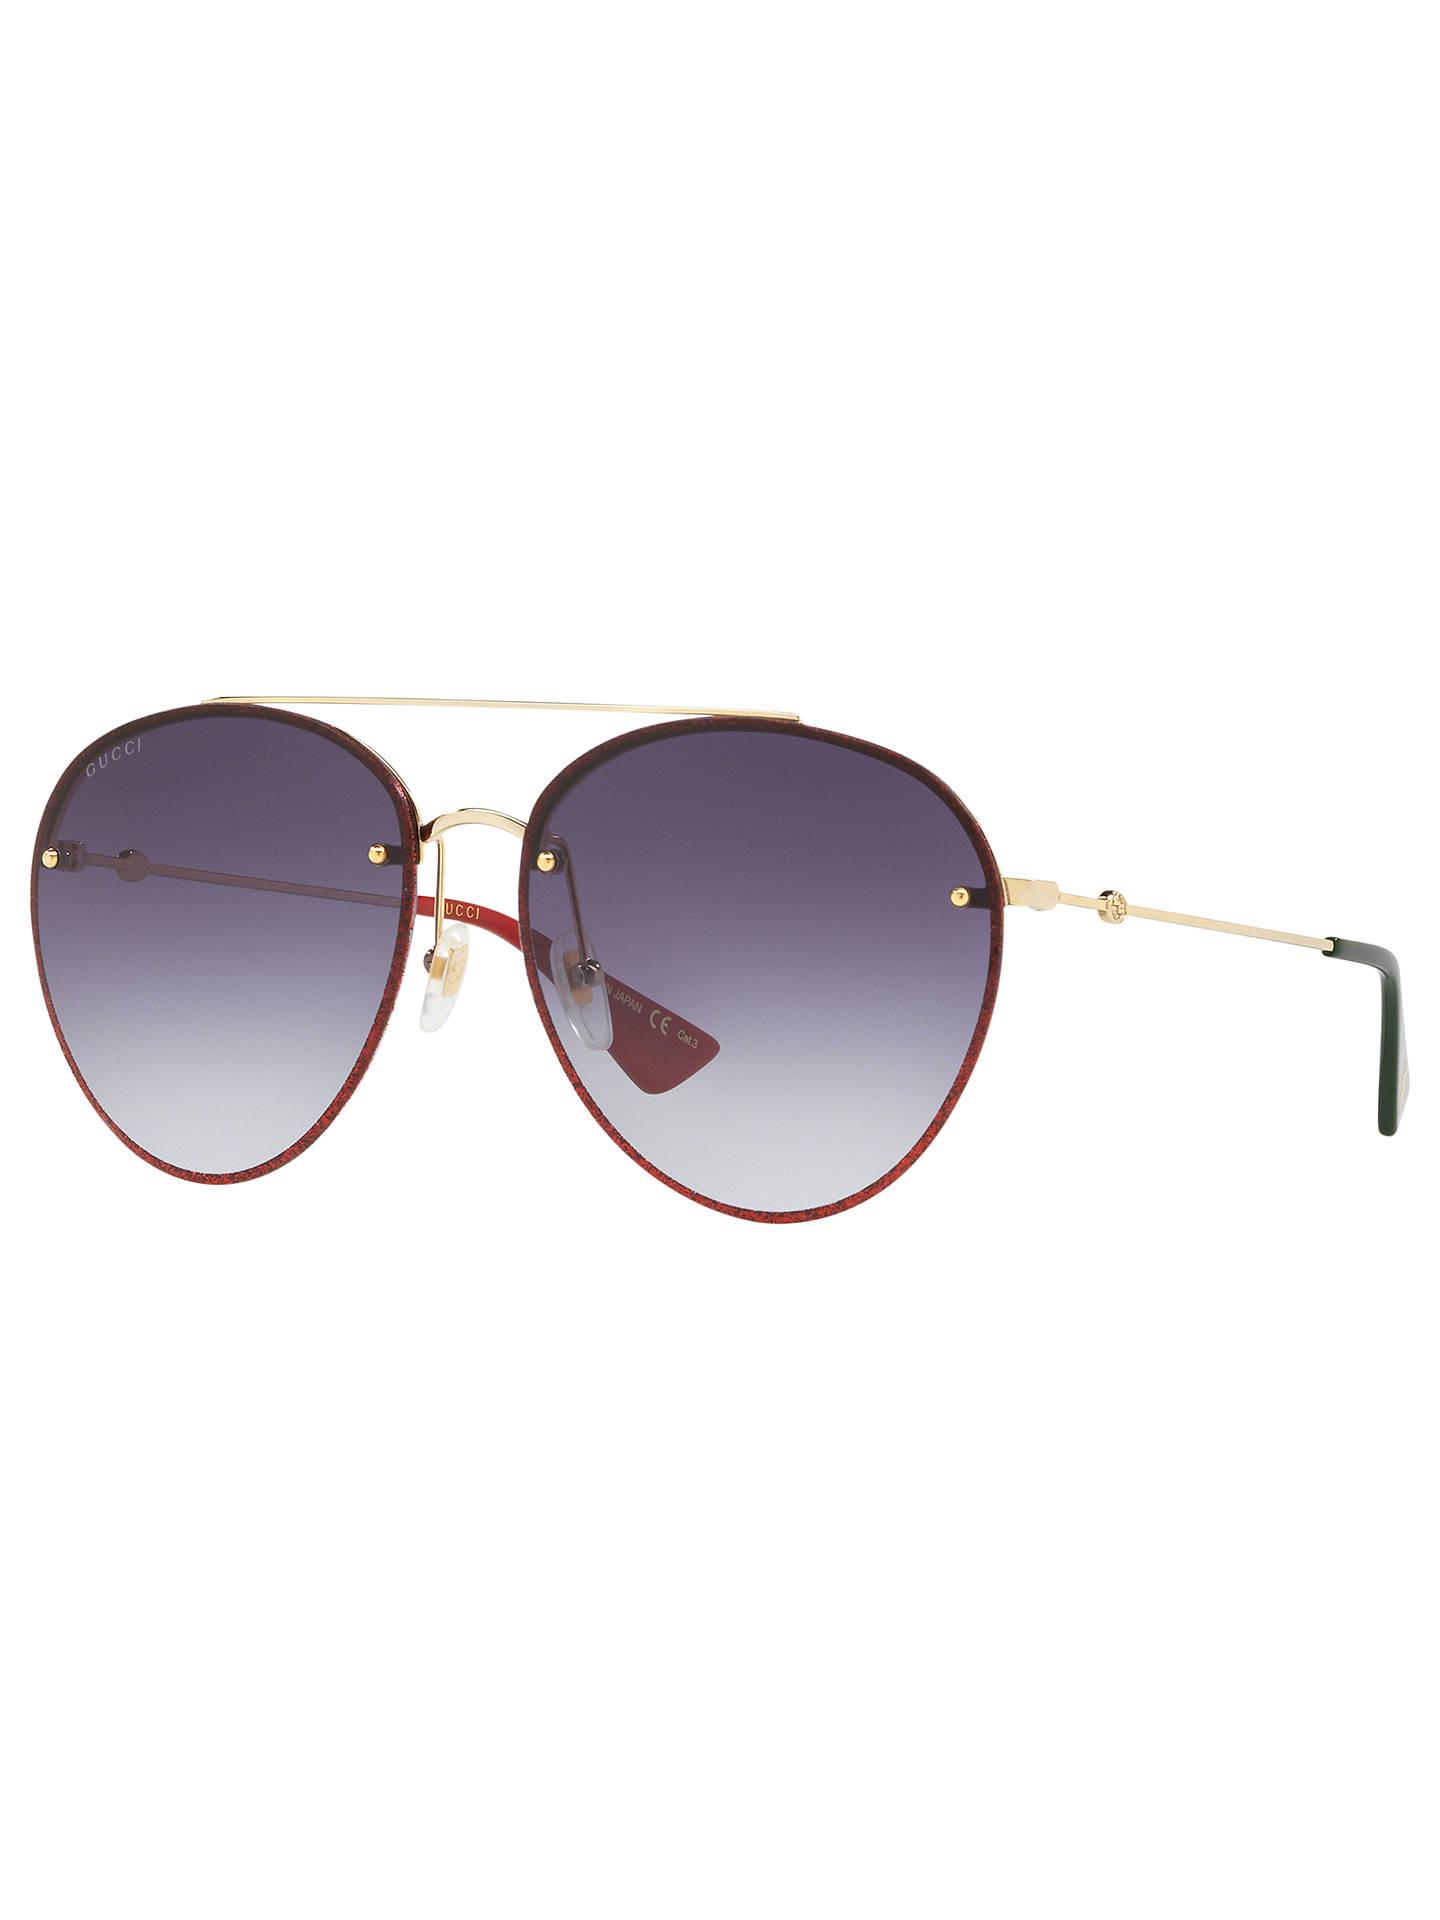 1553ac51e2 BuyGucci GG0351S Women s Aviator Sunglasses